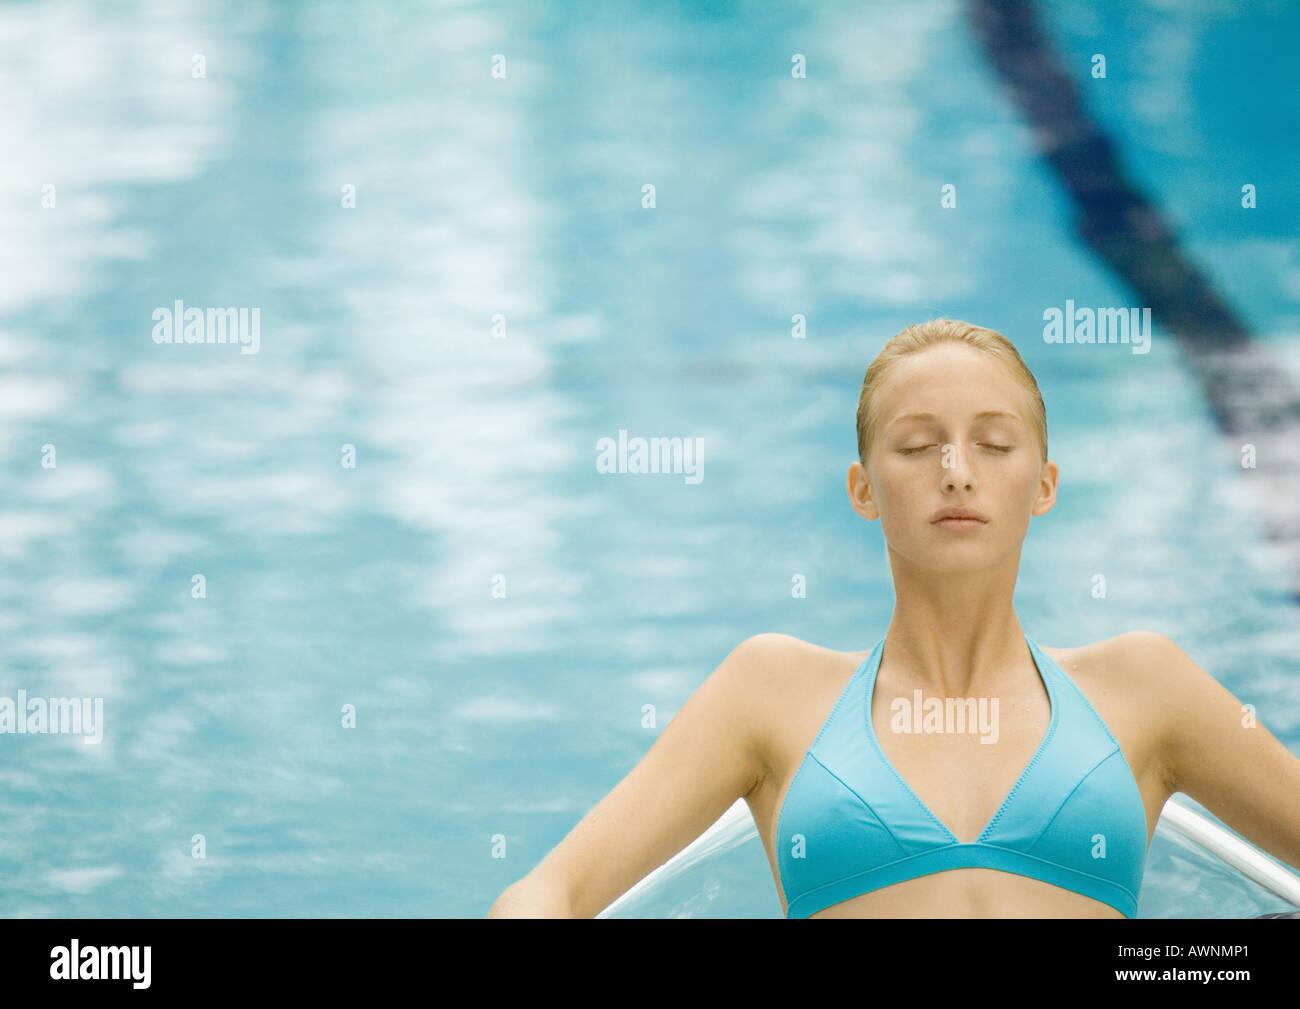 Frau entspannenden Pool, Augen geschlossen Stockbild